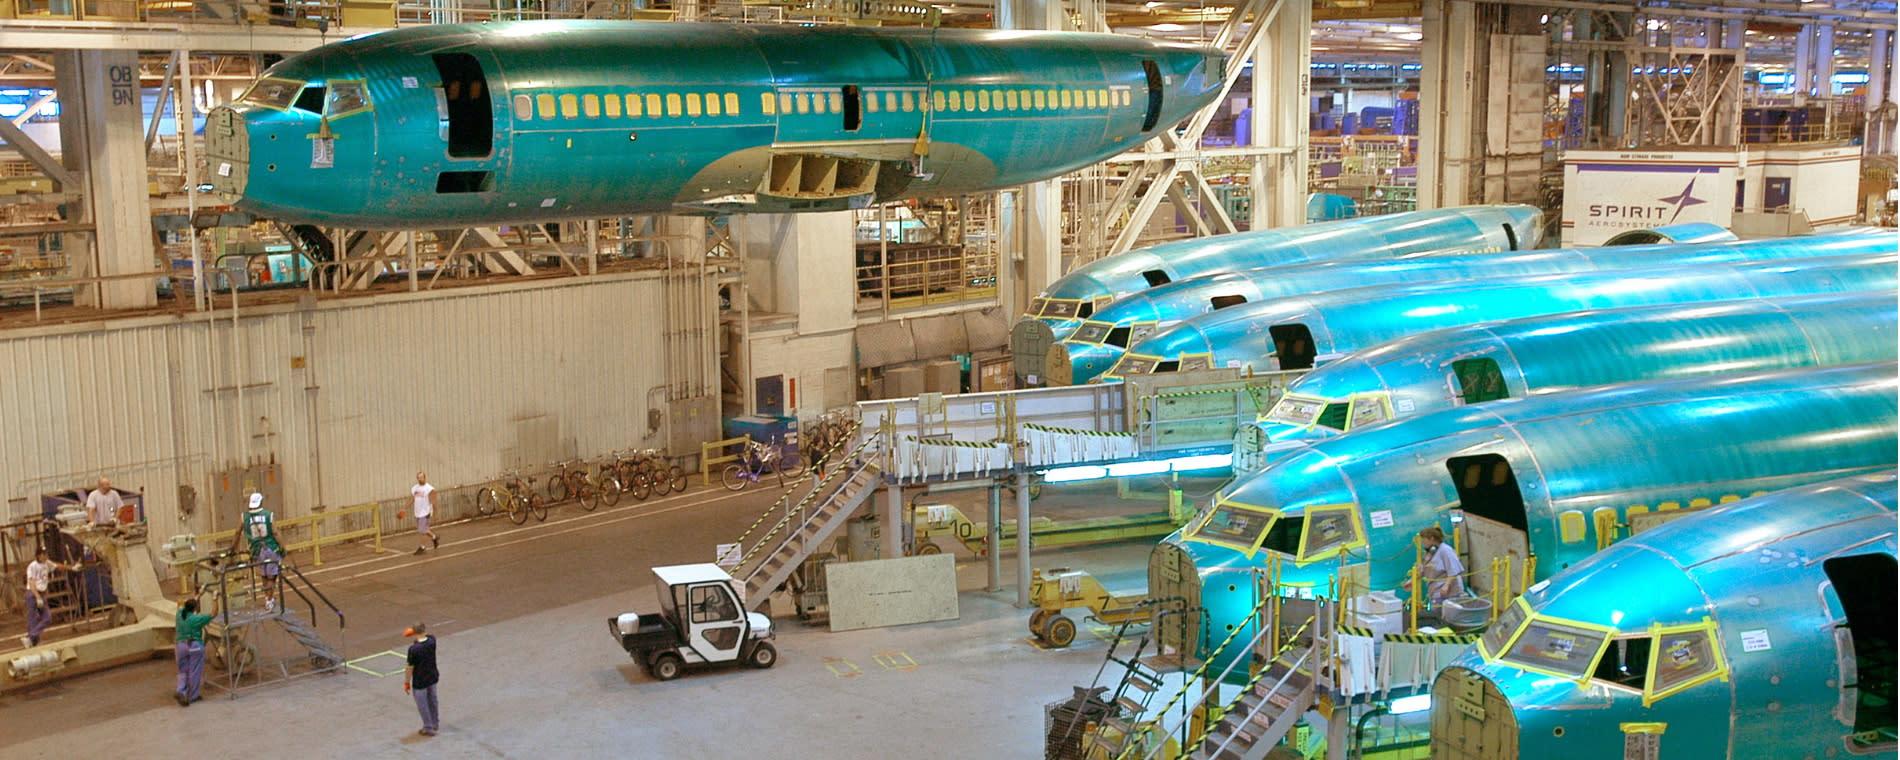 Spirit AeroSystems_B737 Production Line 2_2010